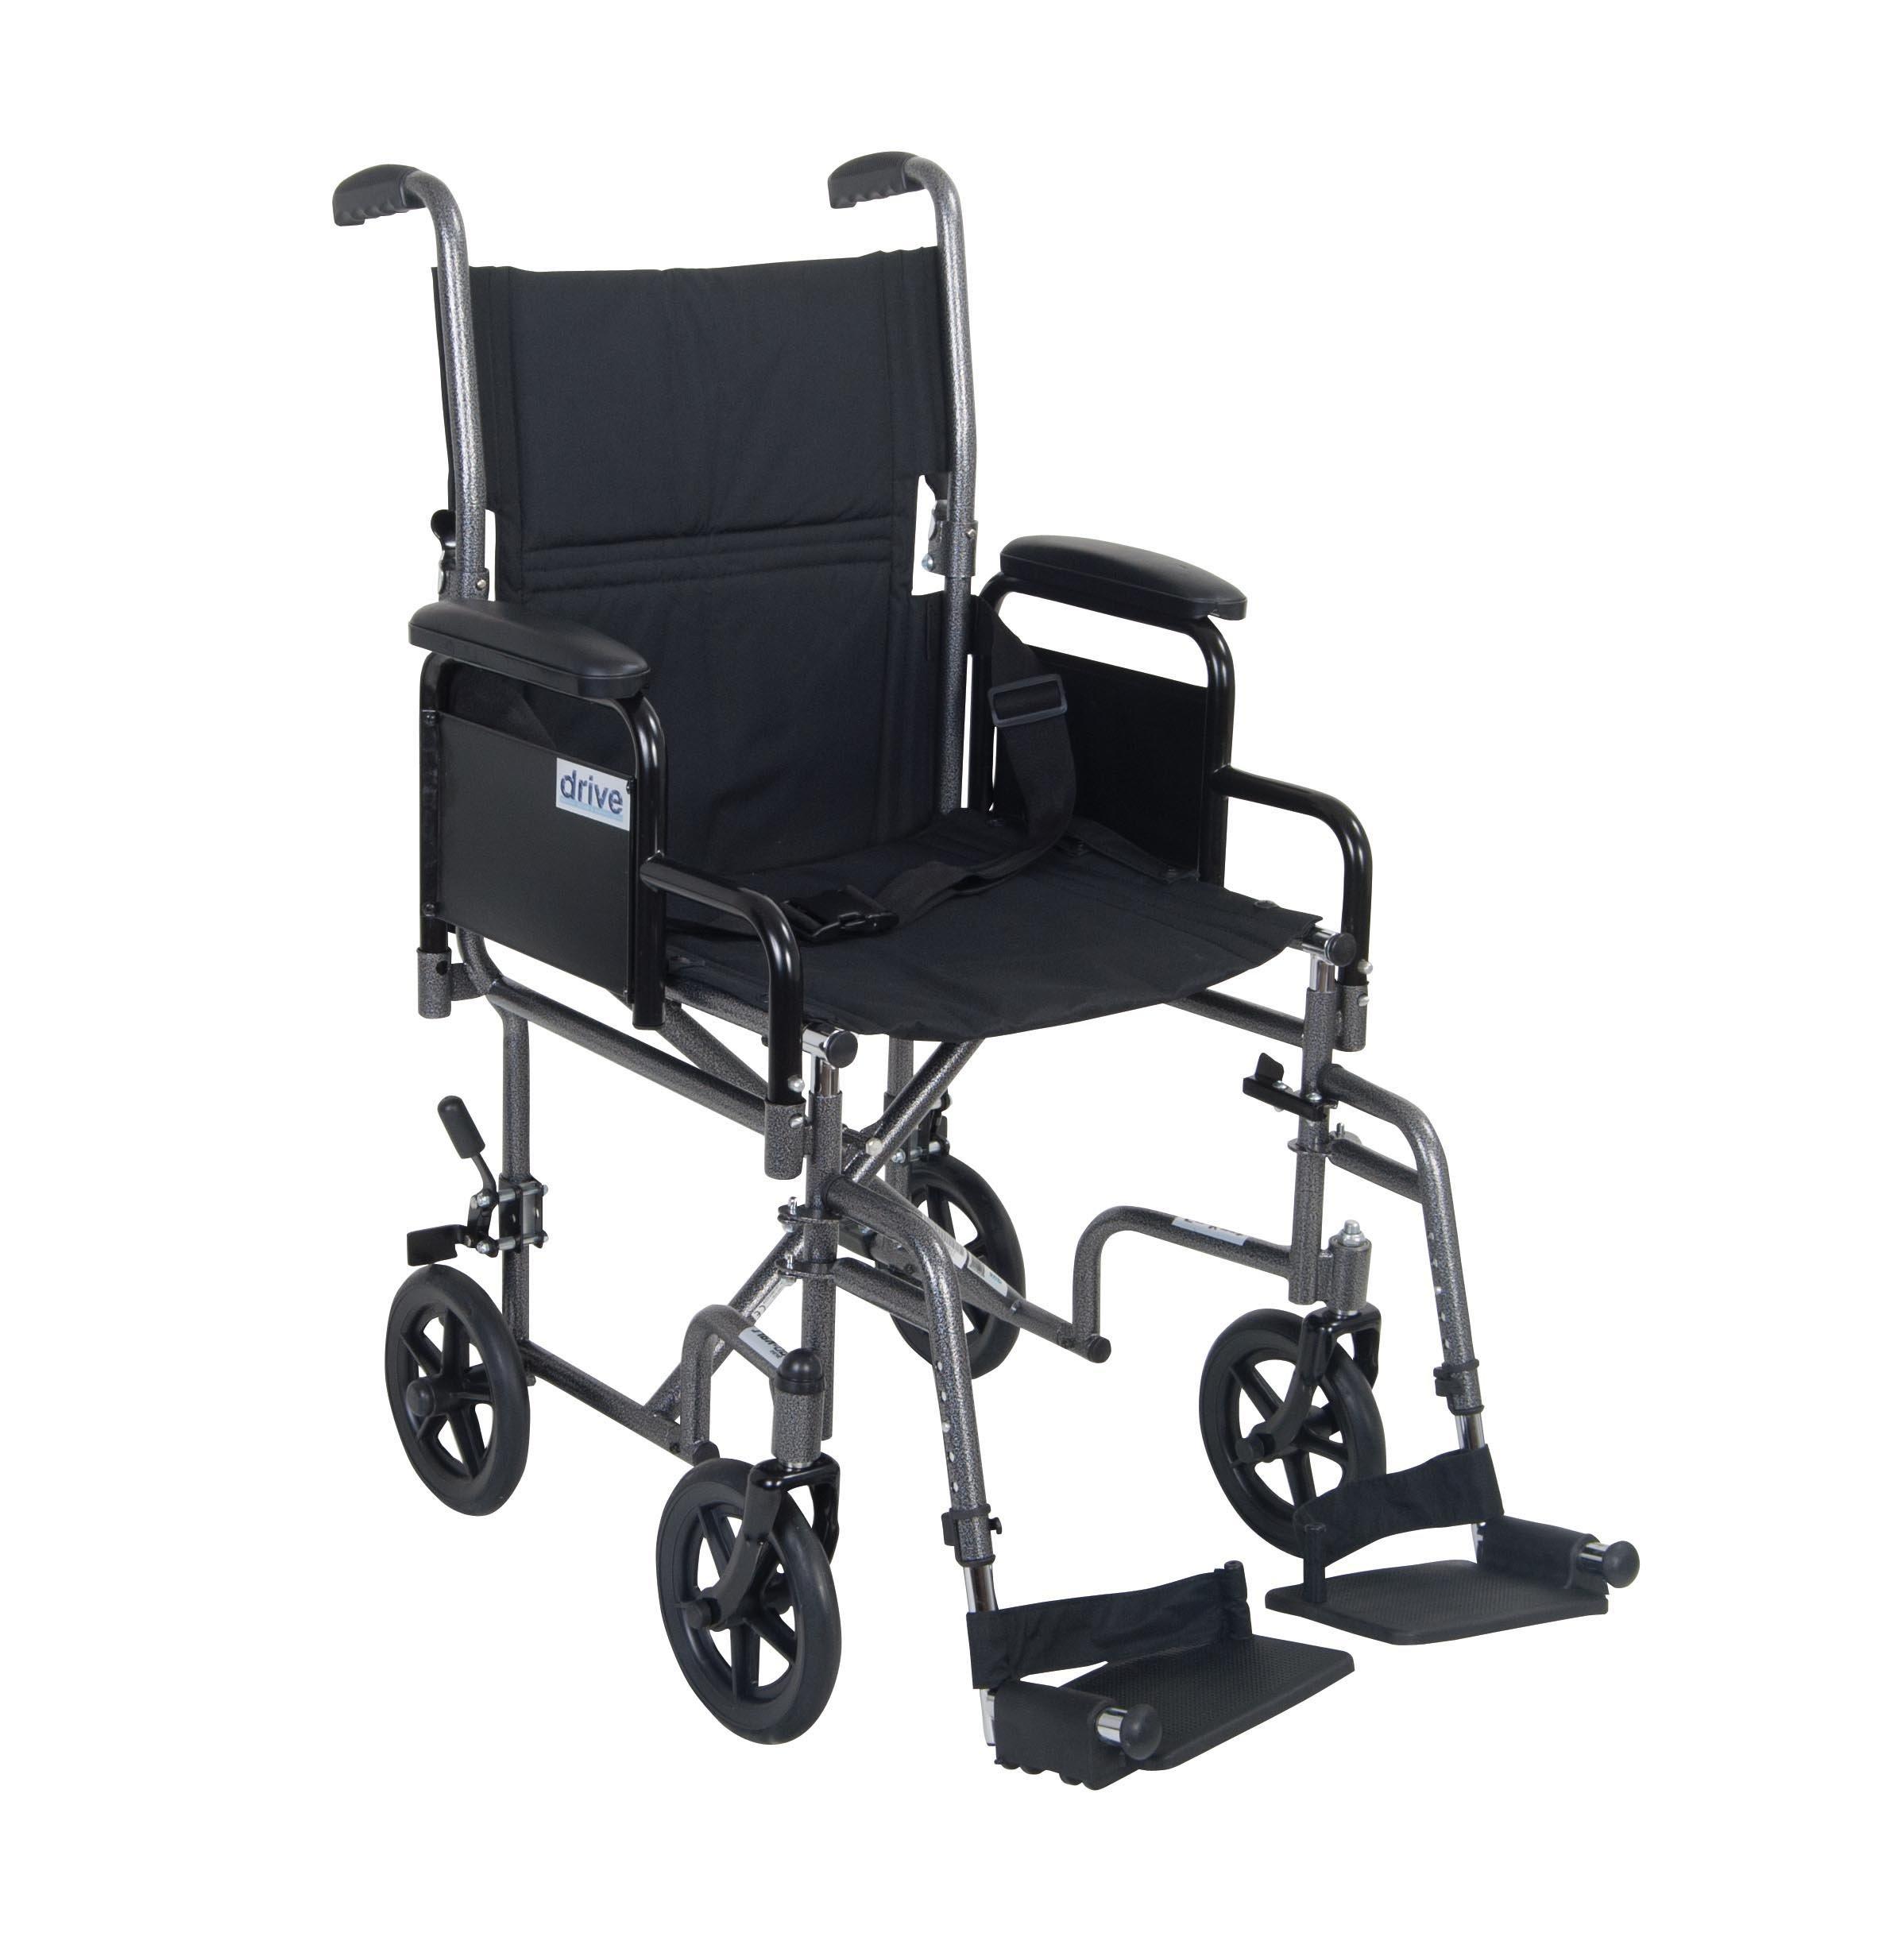 Drive Medical Lightweight Steel Transport Wheelchair, Detachable Desk Arms, 19'' Seat